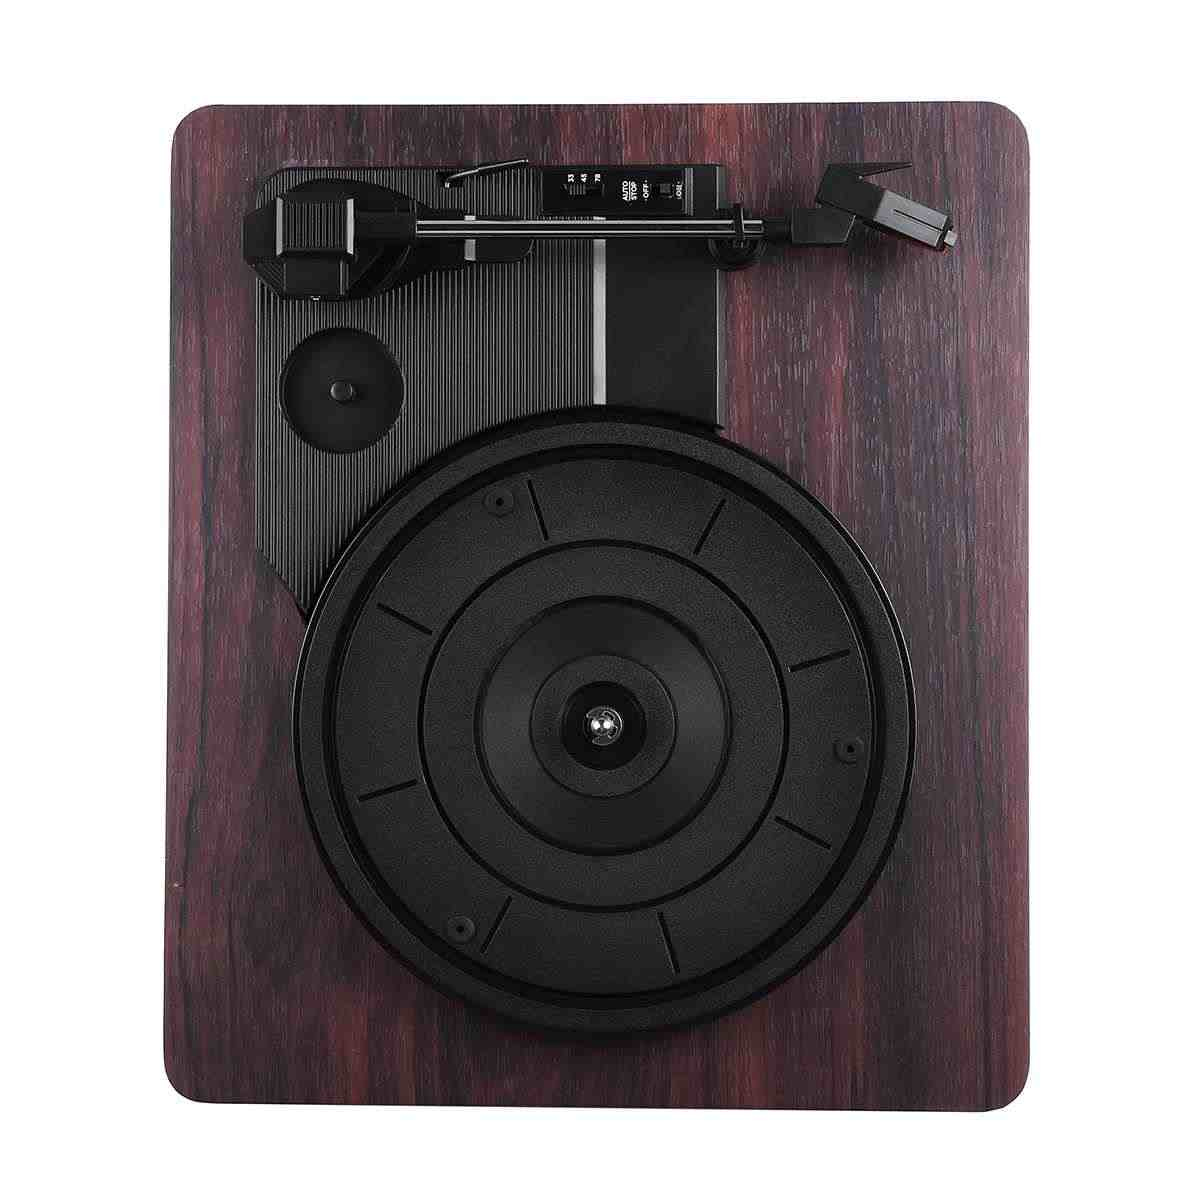 33 、 45 、 78 Rpm 録音プレーヤーアンティーク蓄音機ターンテーブルディスクビニールオーディオ RCA R/L 3.5 ミリメートル出力 Out USB DC 5V の木の色